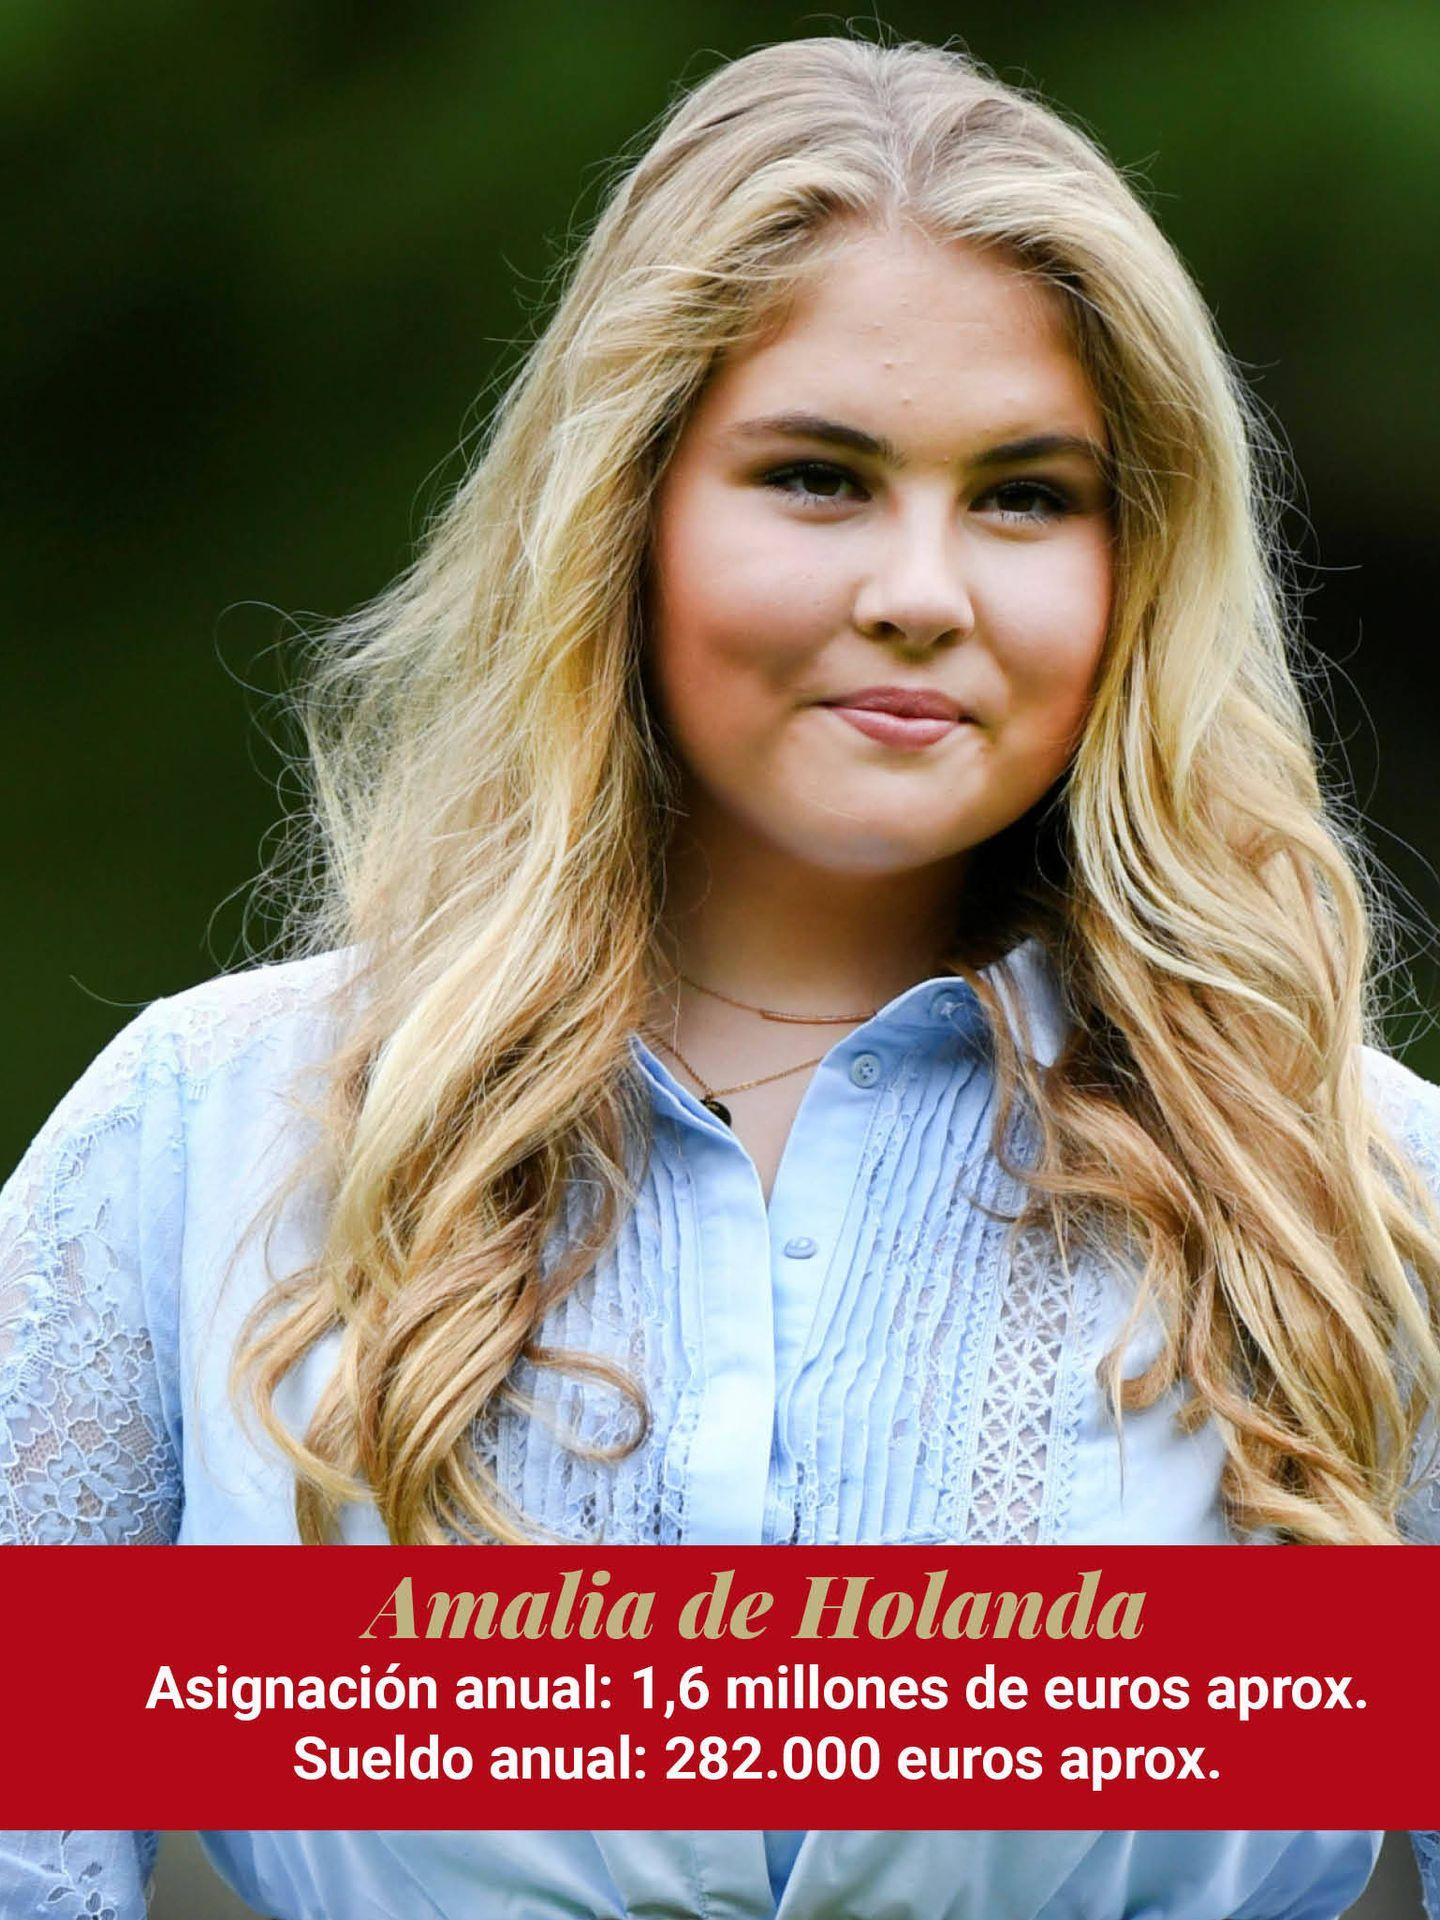 Amalia de Holanda.